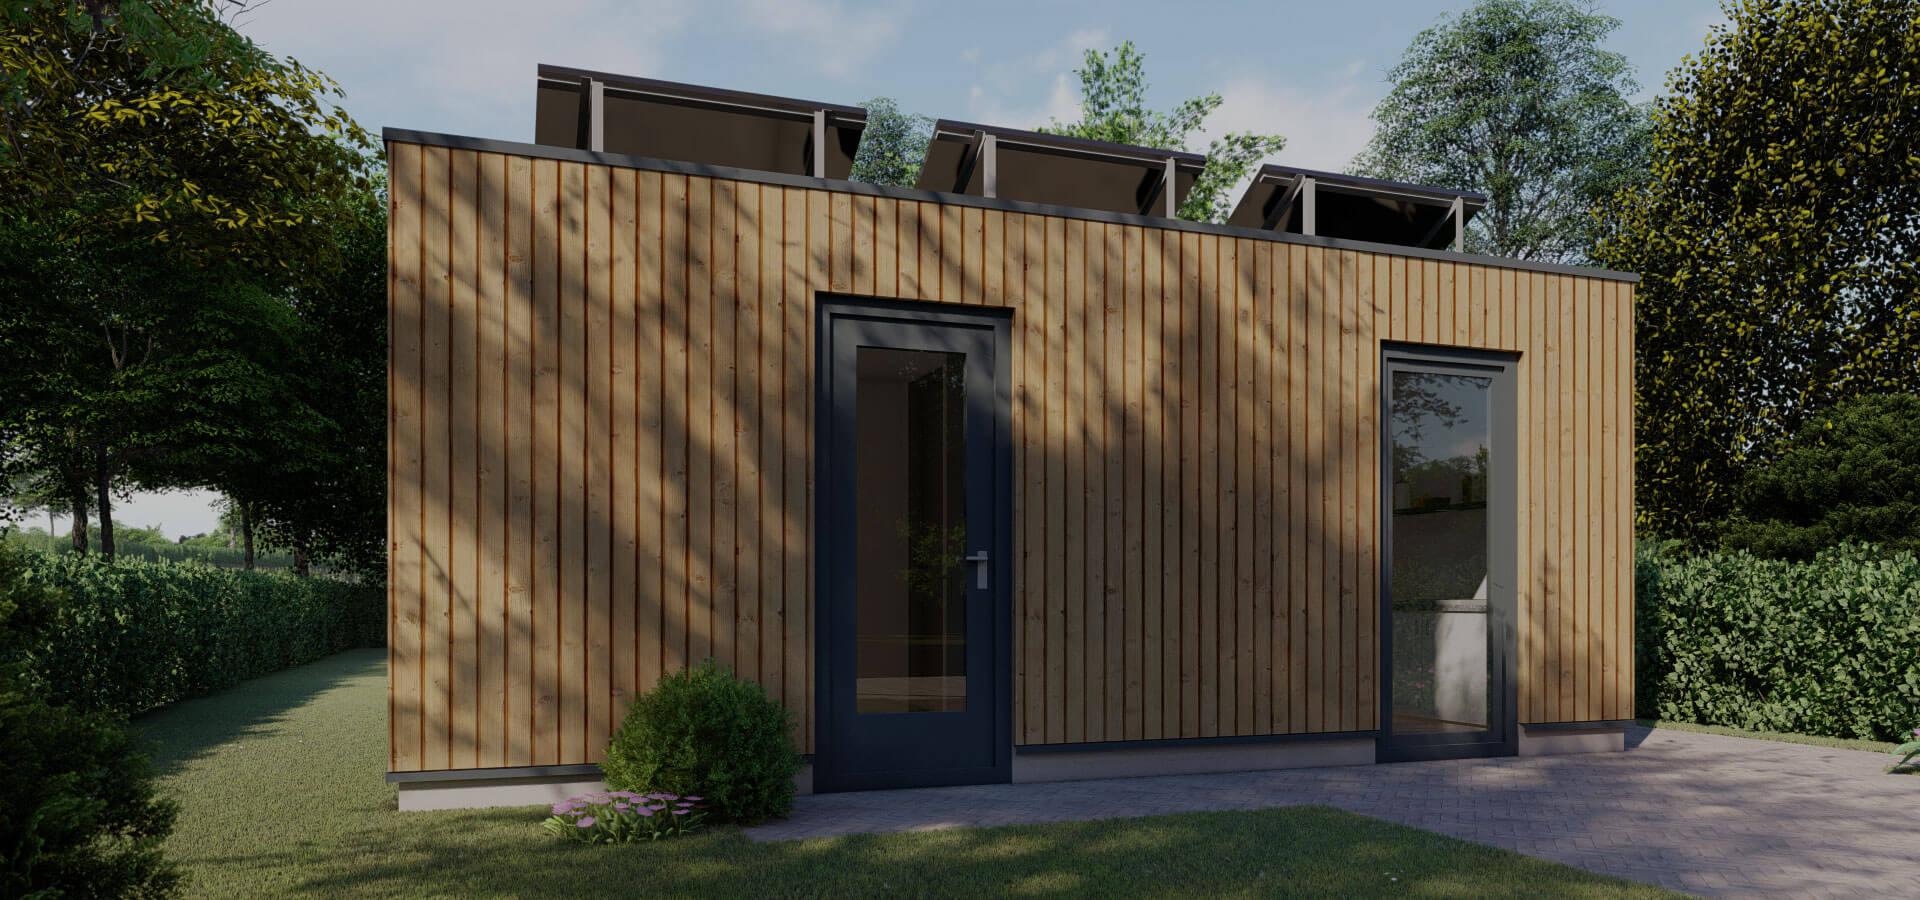 Tiny House_Type Alaska_Innoblox